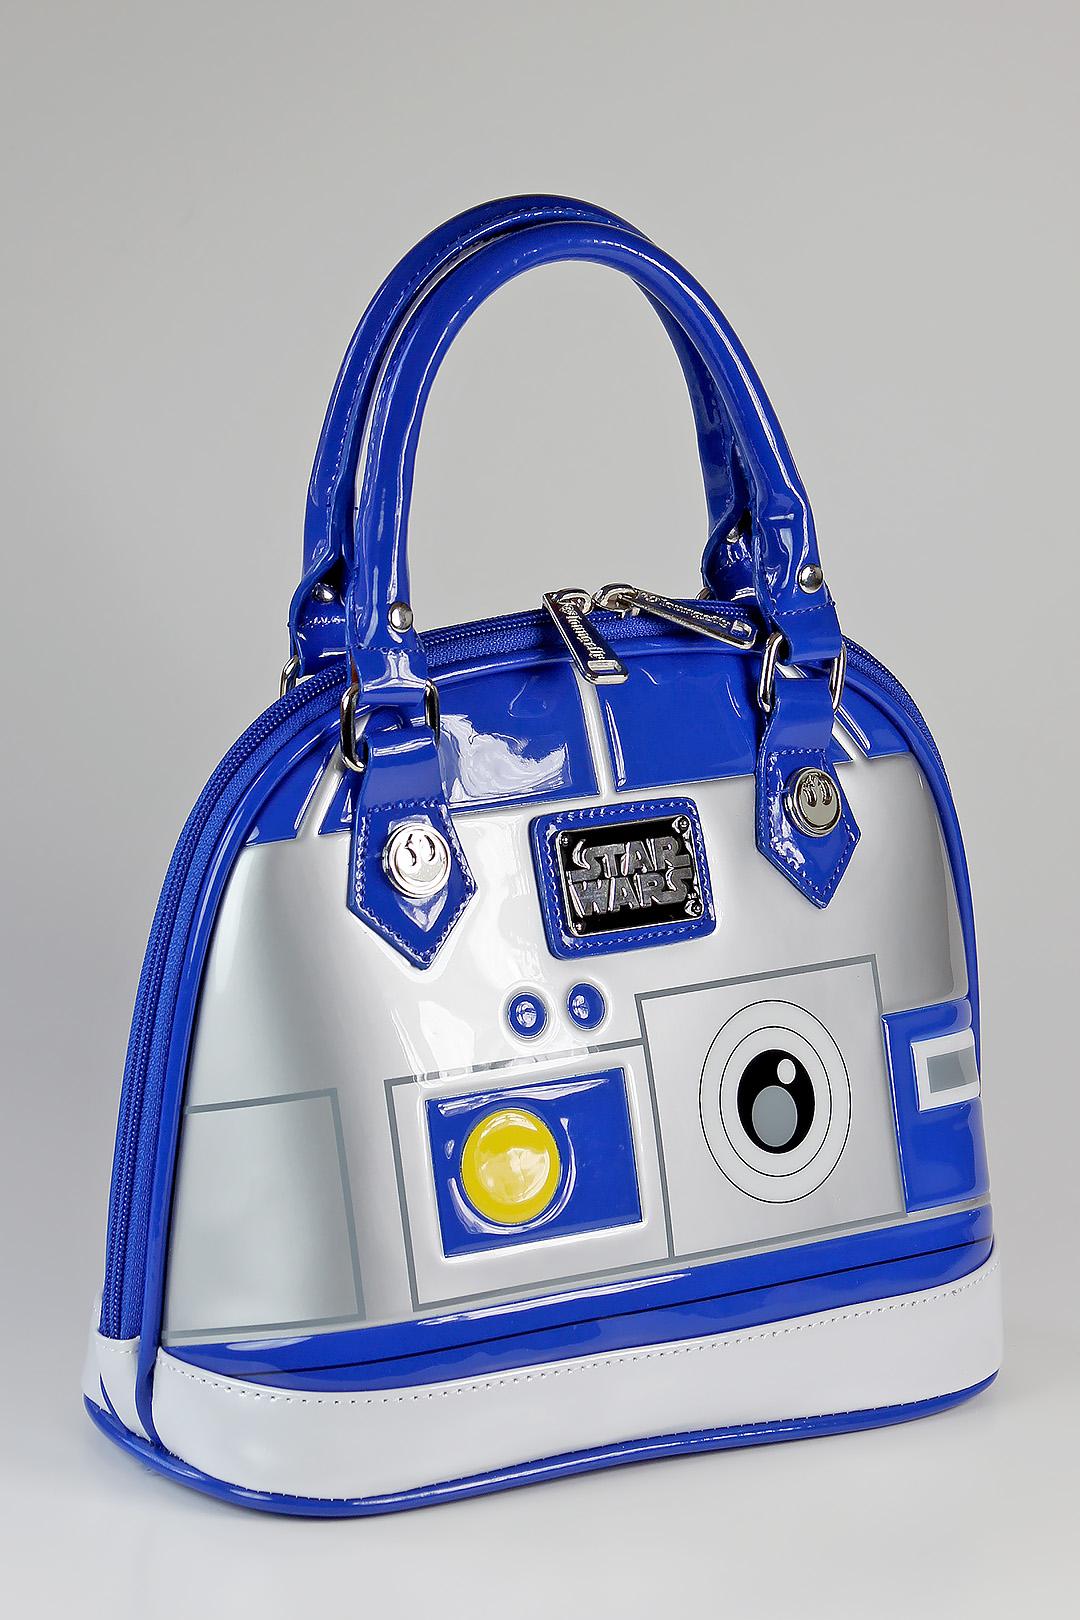 Loungefly - R2-D2 handbag (back)